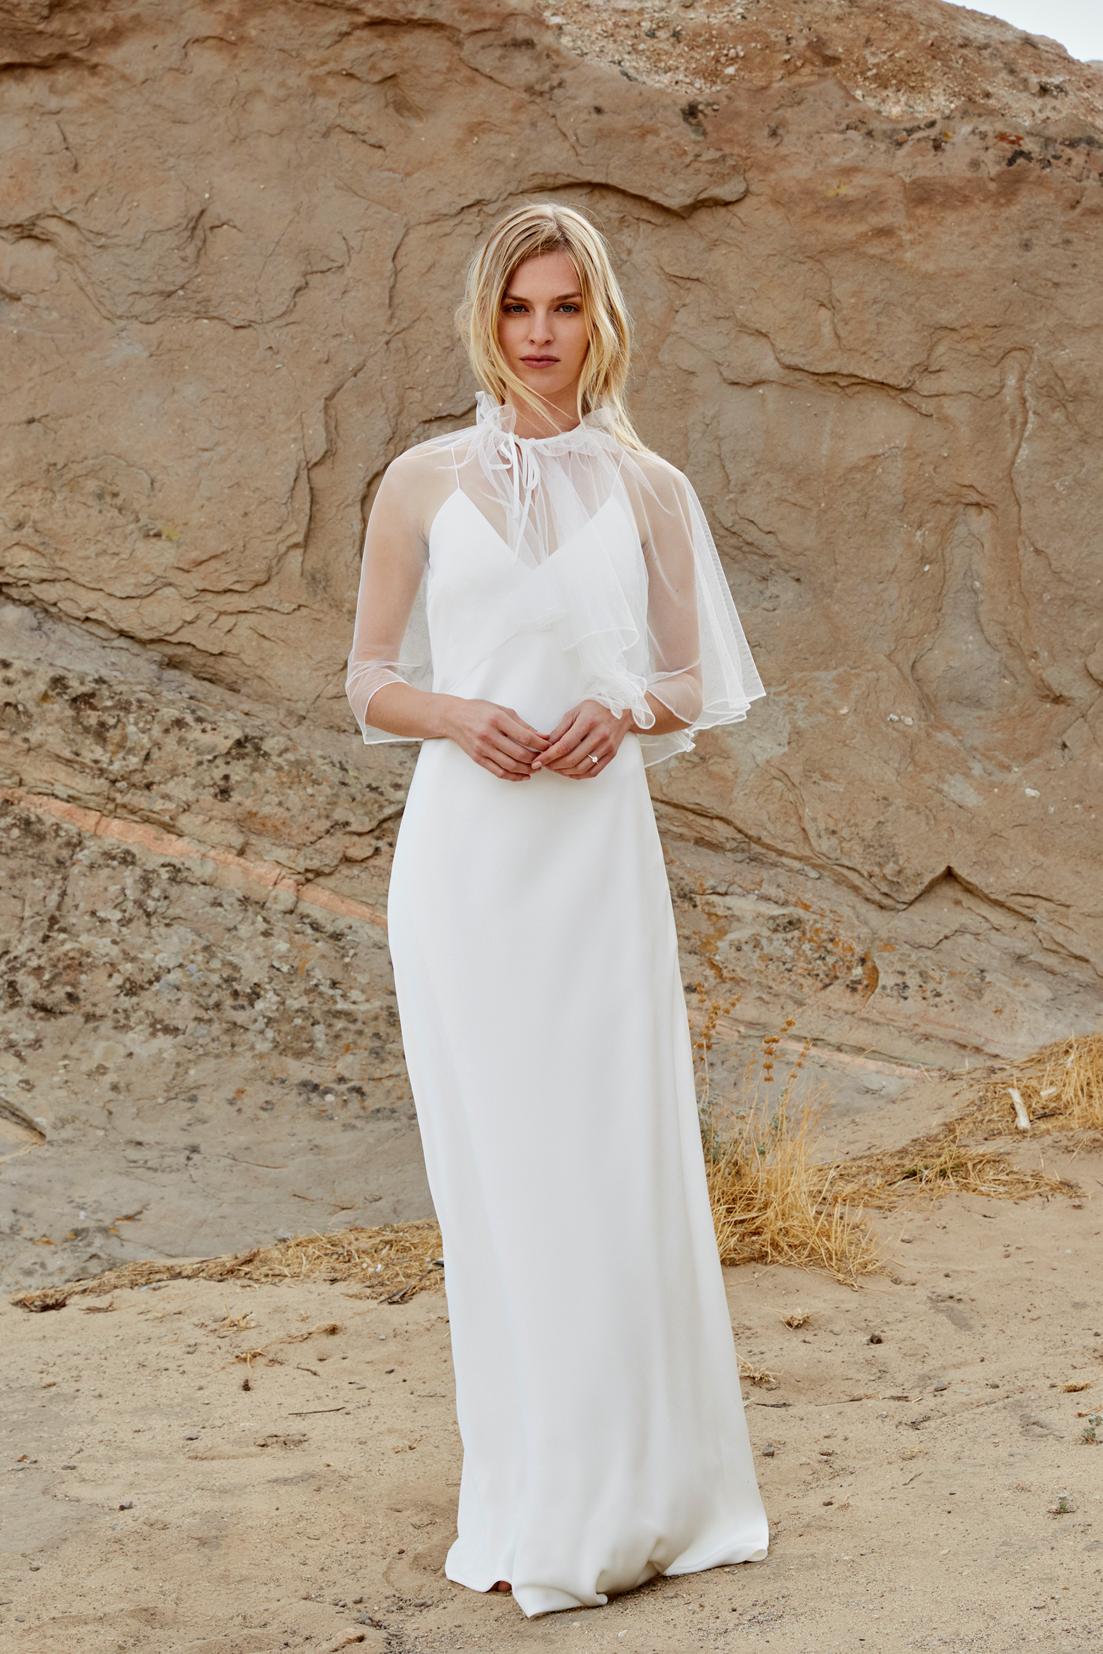 savannah miller fall 2018 chiffon cape spaghetti strap wedding dress